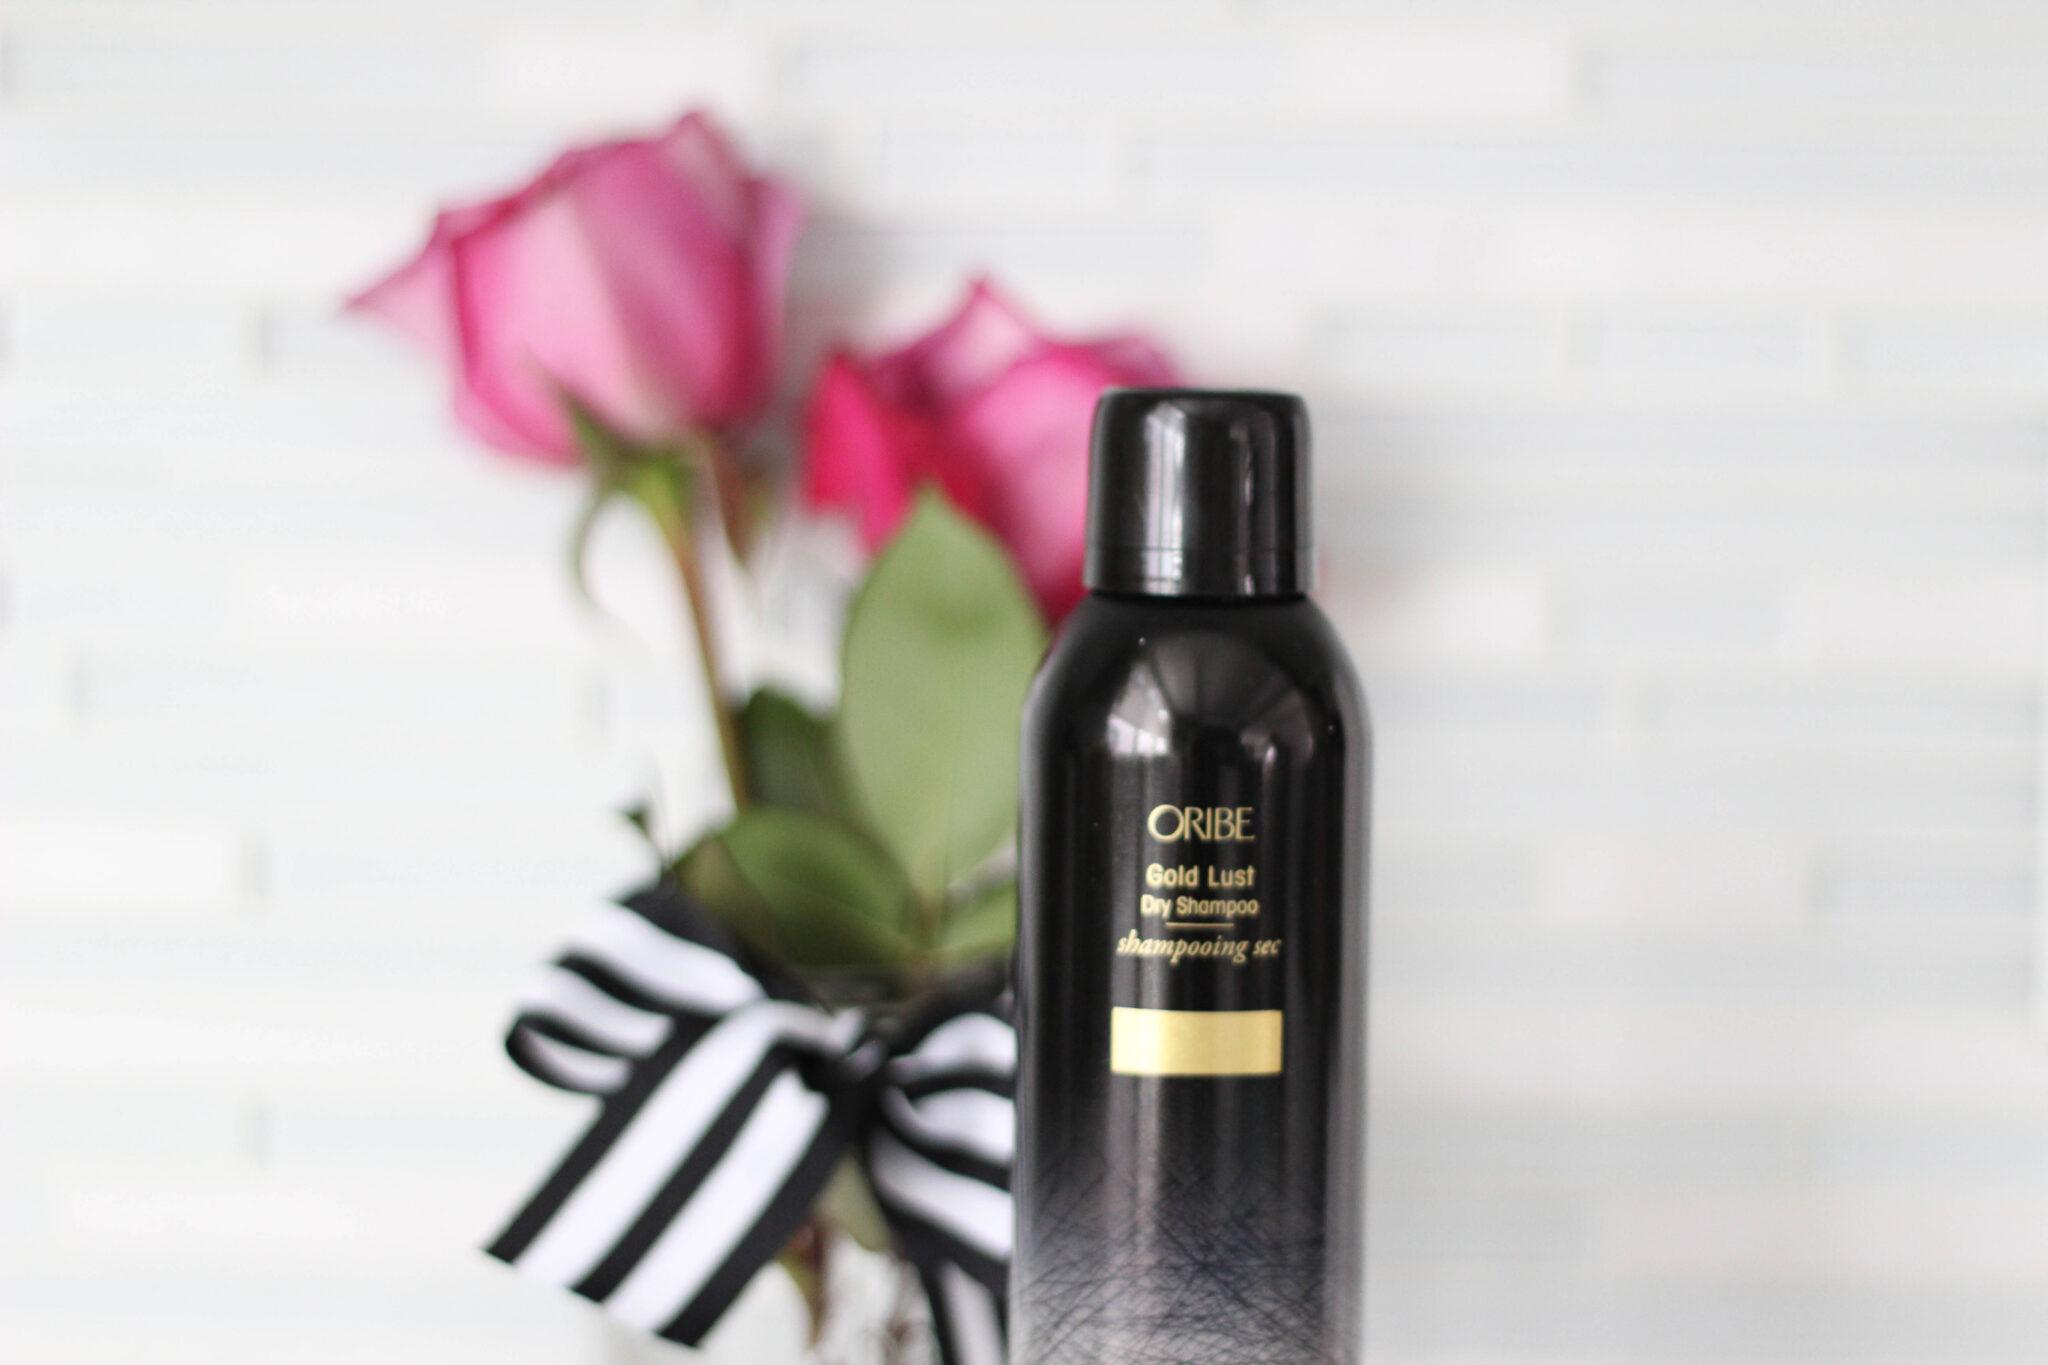 how to use dry shampoo - oribe gold lust dry shampoo